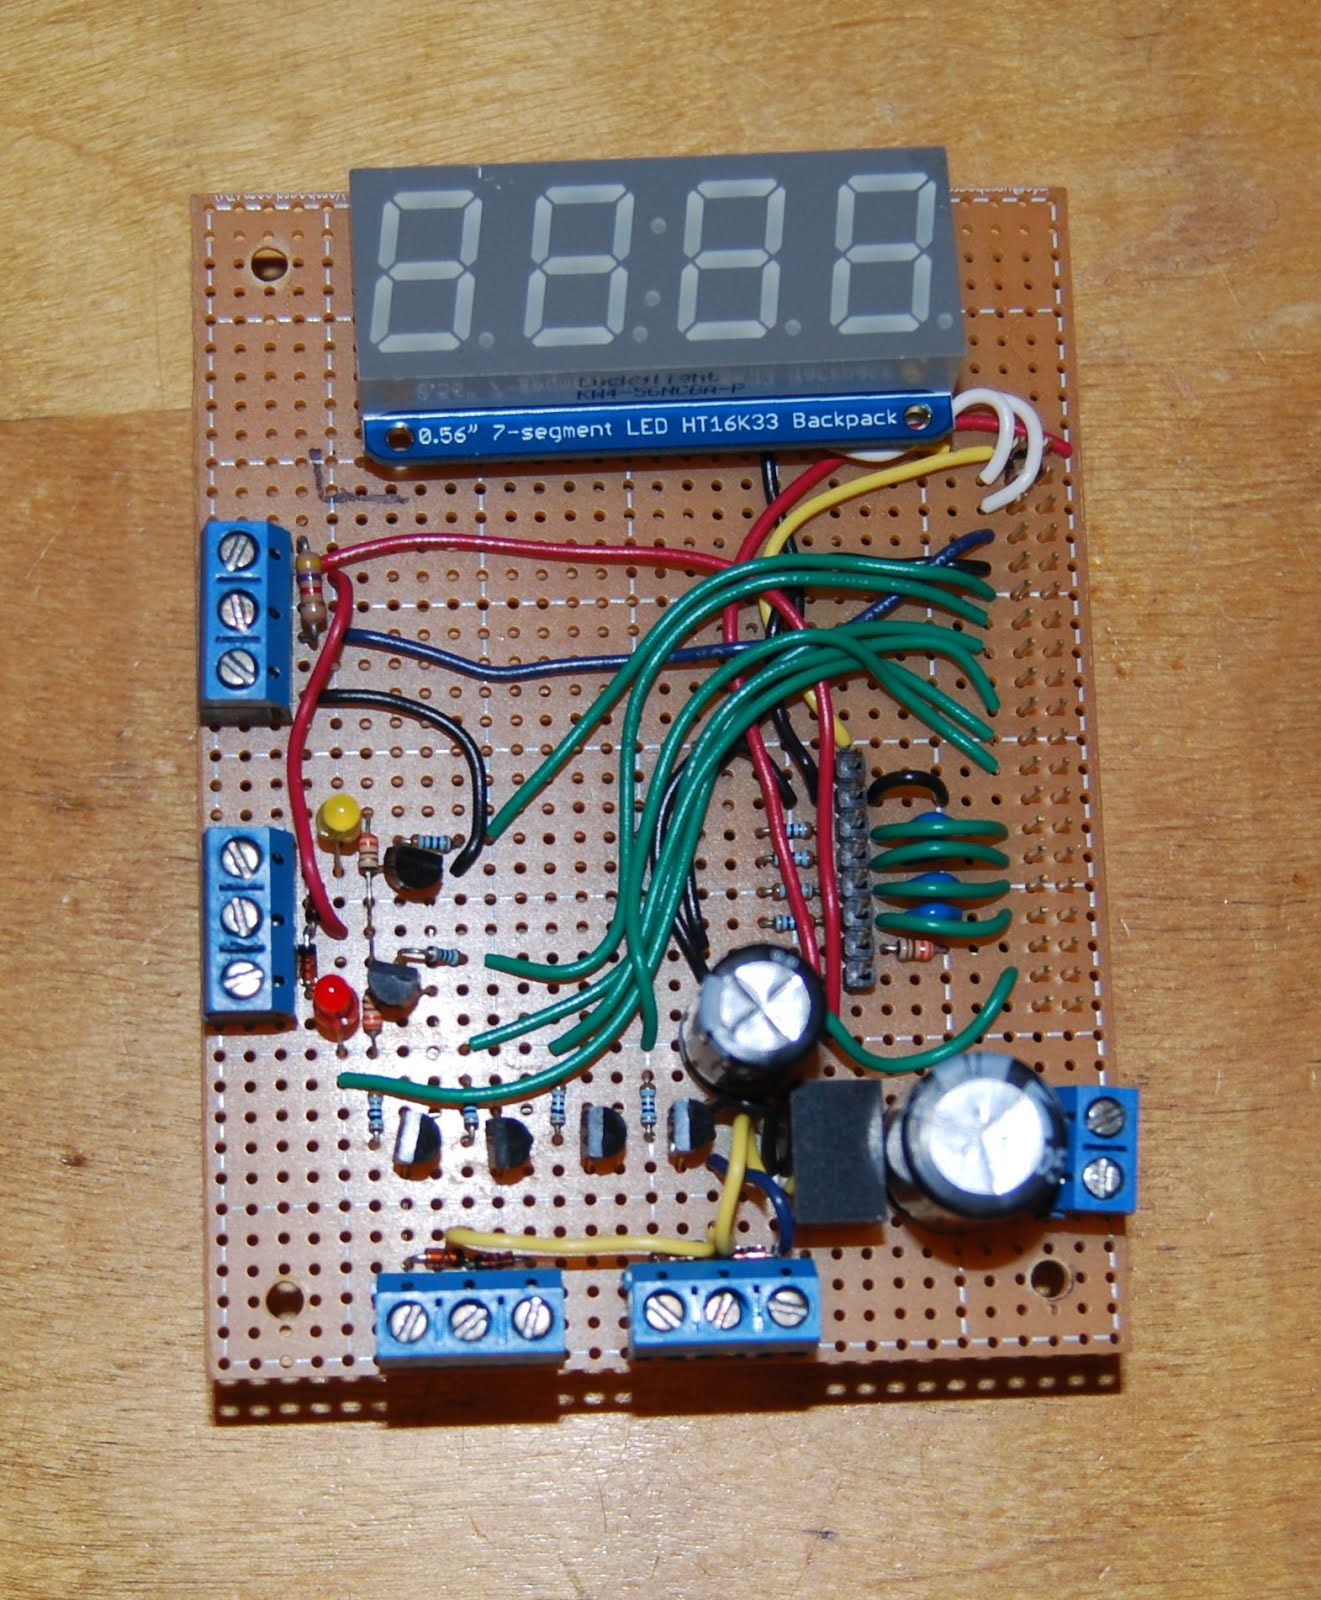 medium resolution of hot tub controller circuit board